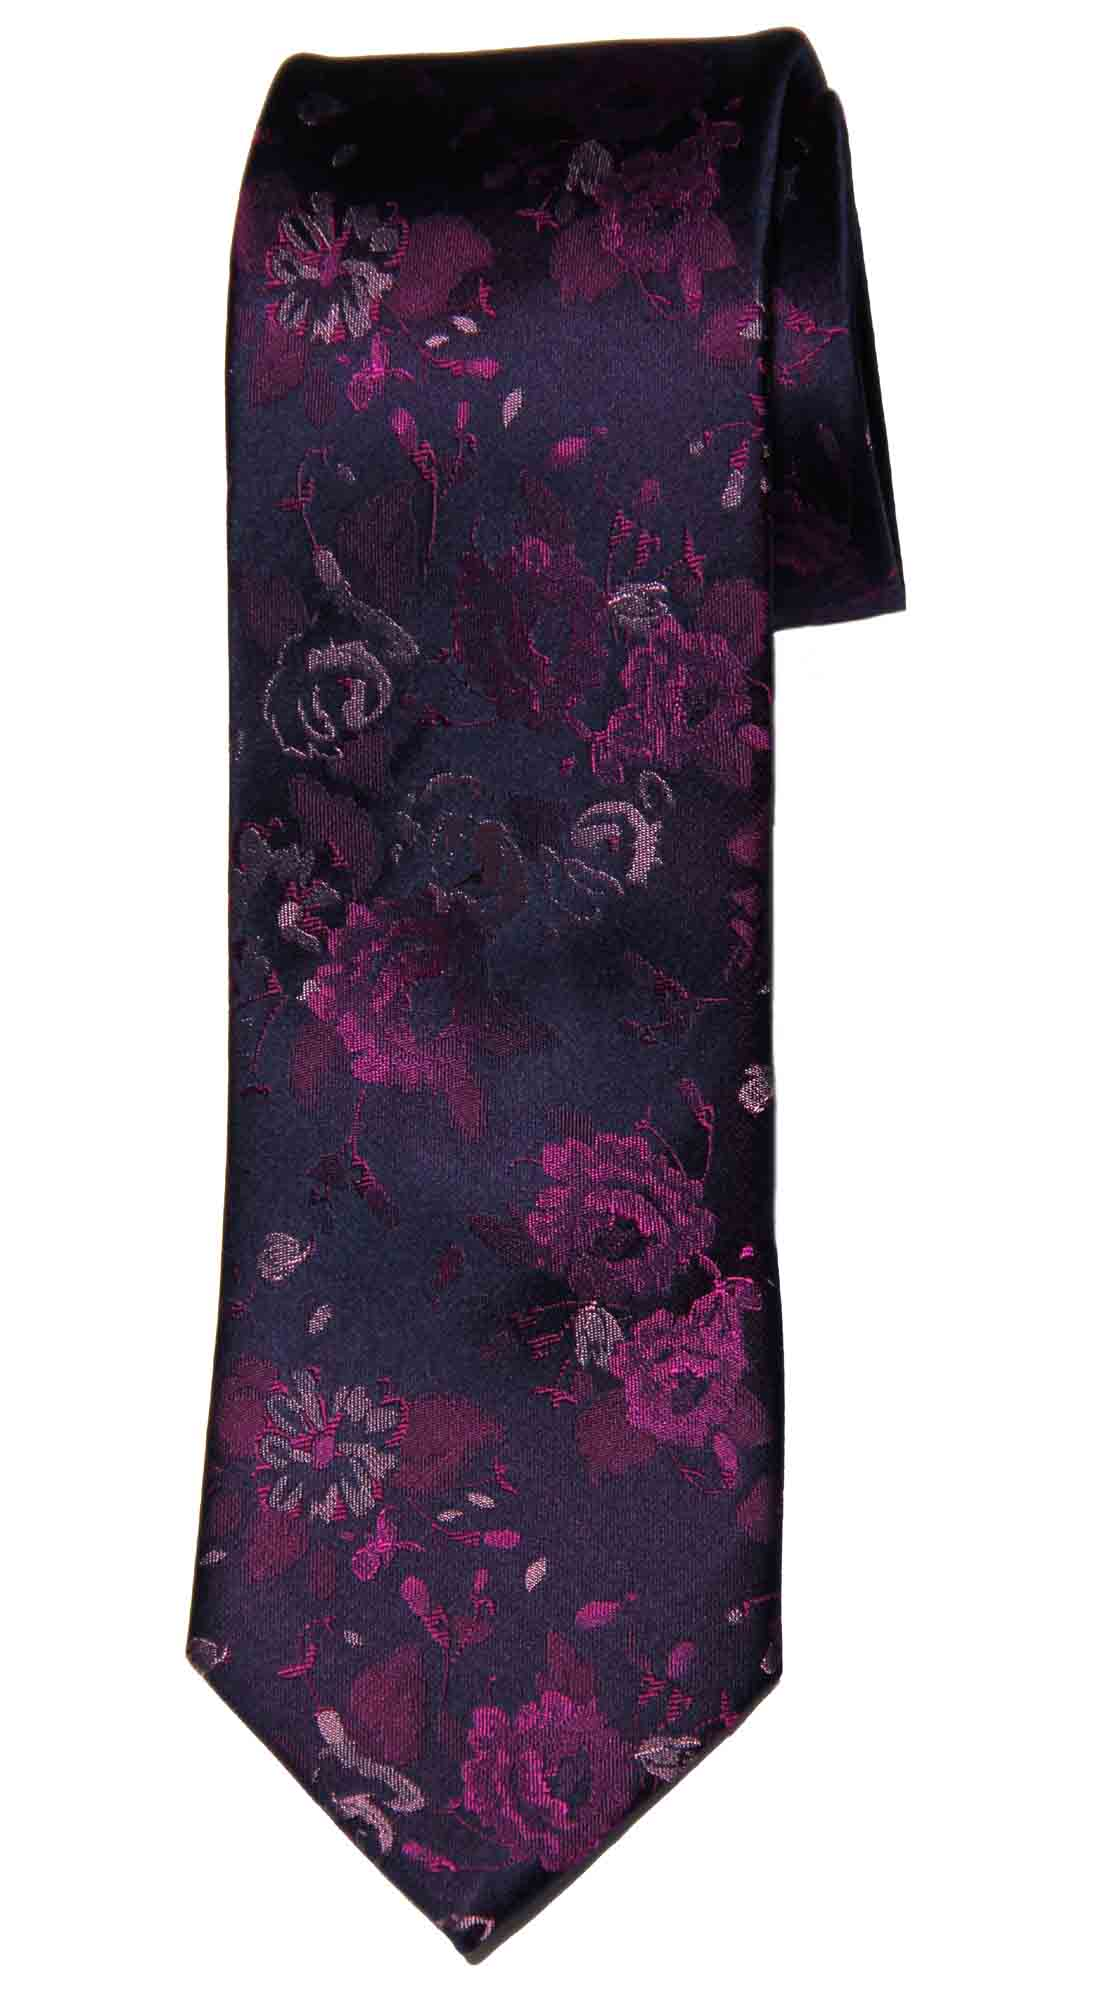 Tresanti Reale Tie Silk Purple Pink Black Floral Men's